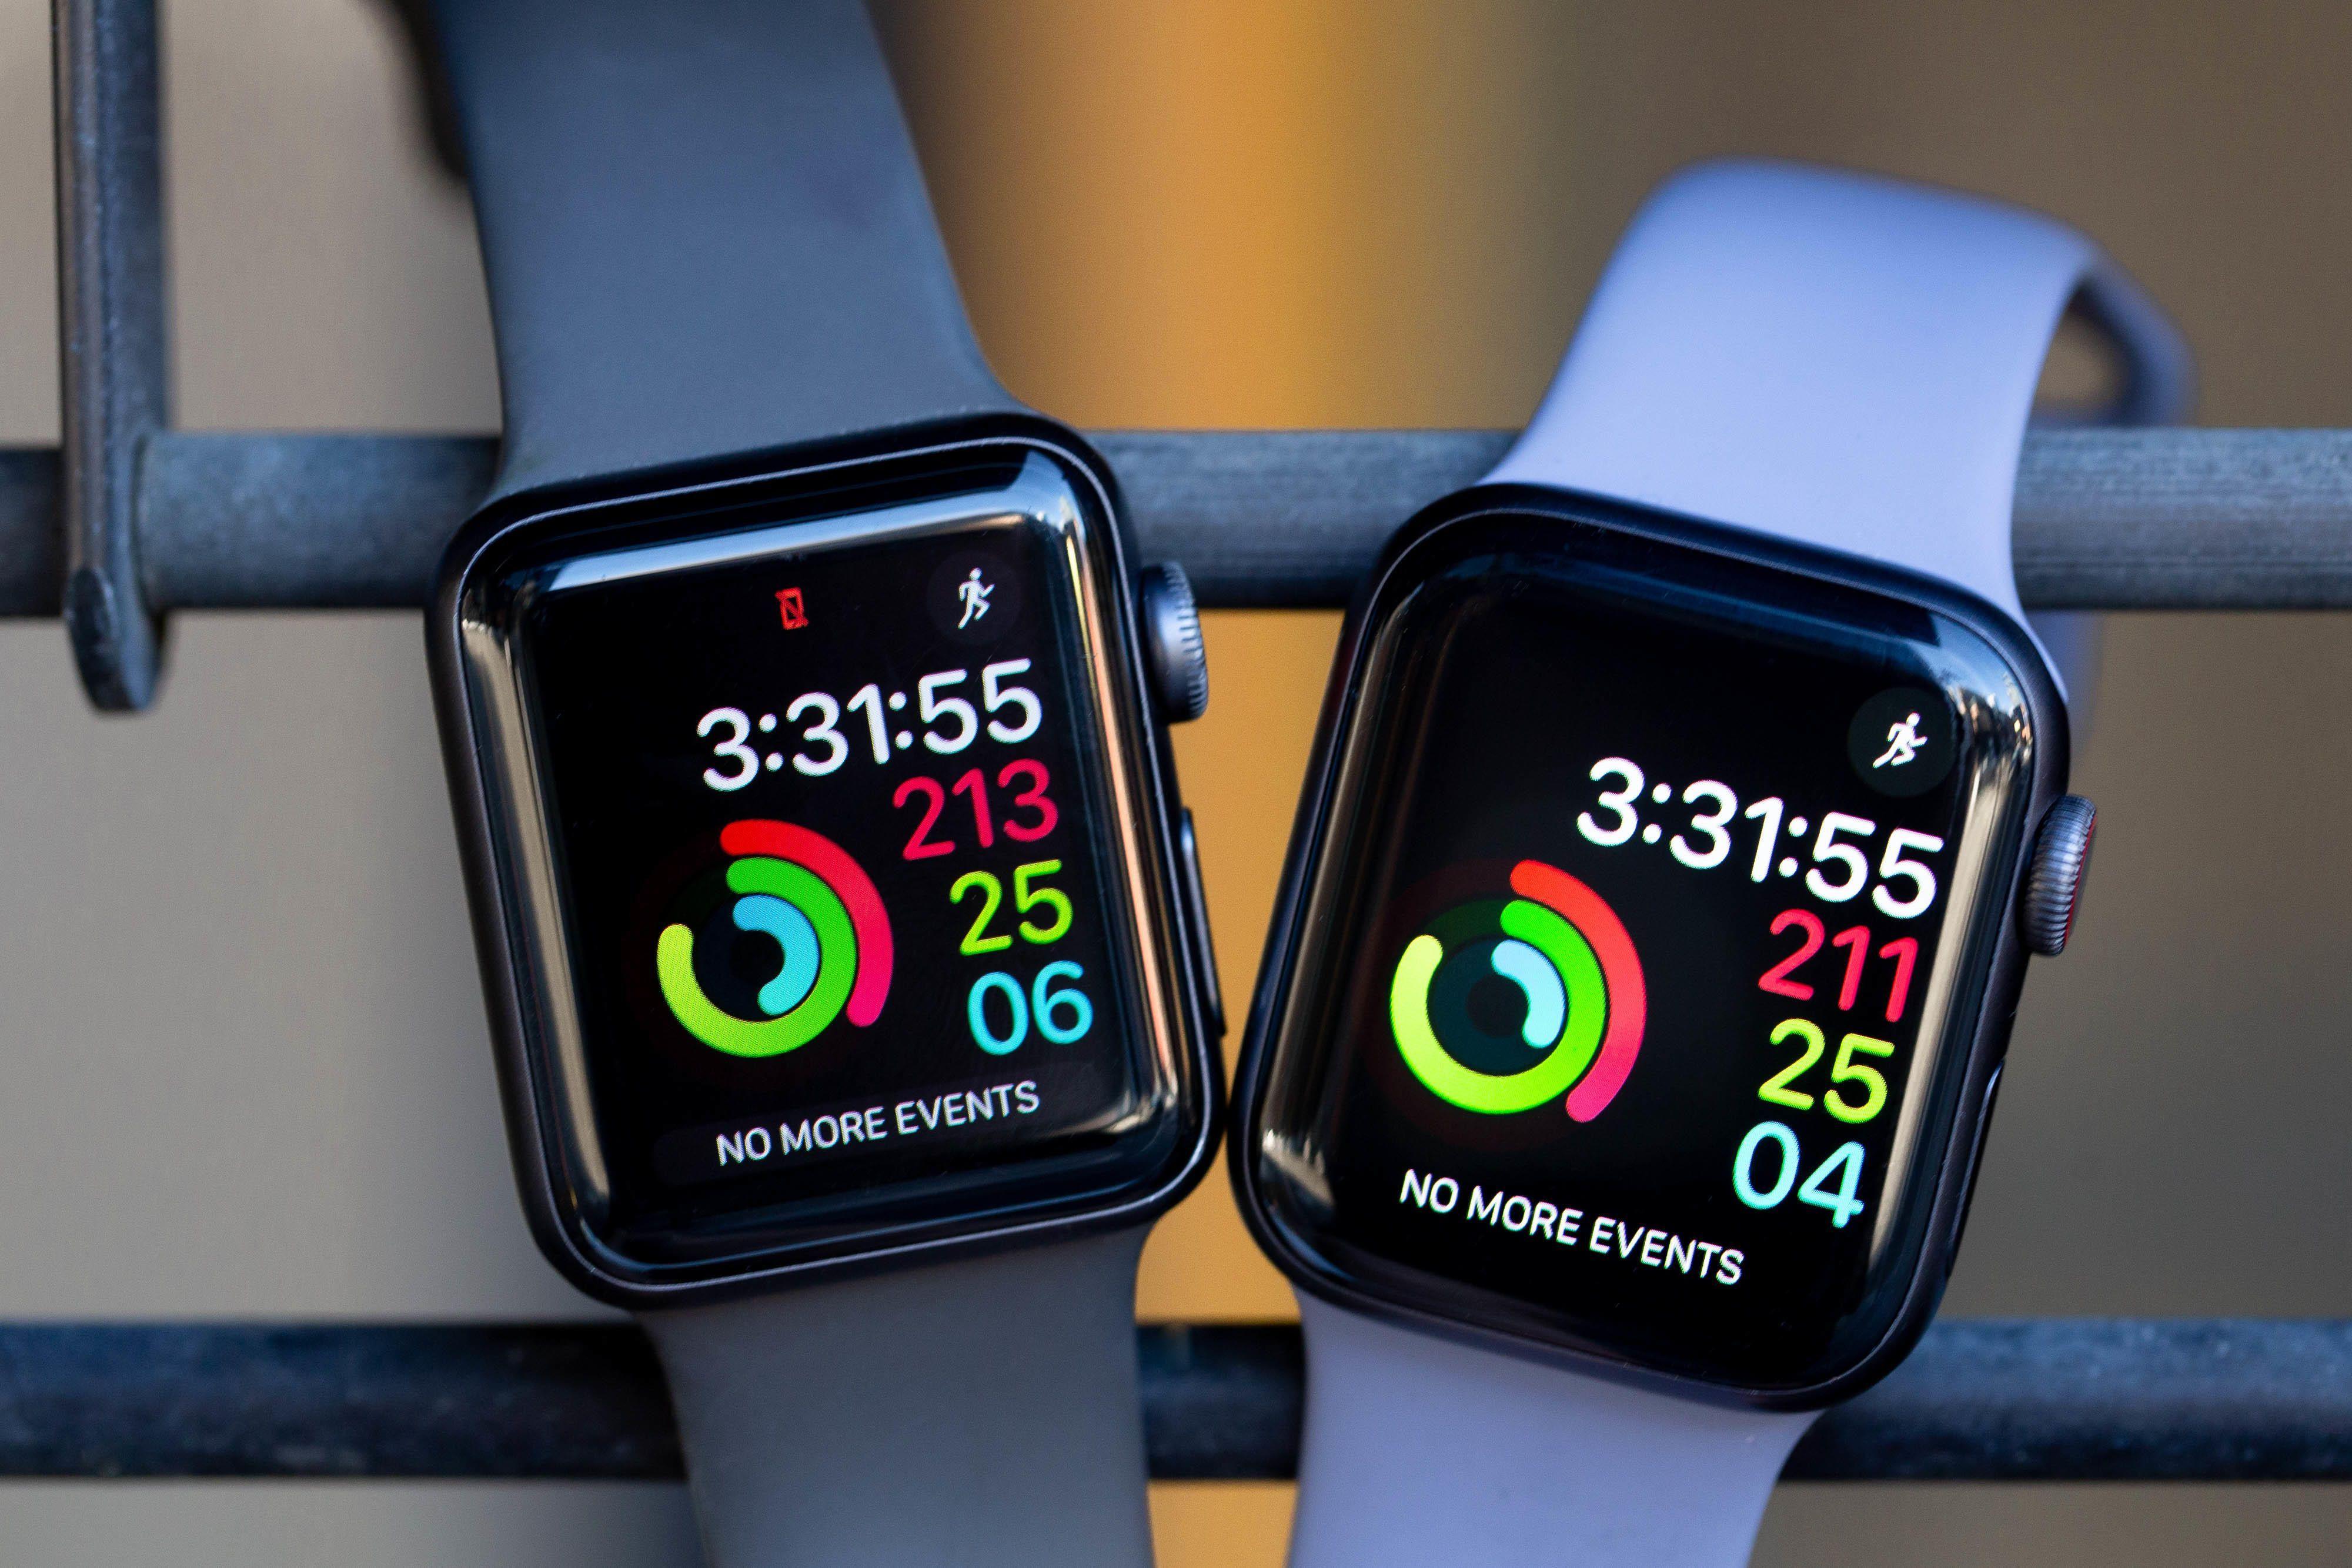 Apple Watch Series 5 Gps Apple Watch Apple Watch Models Smart